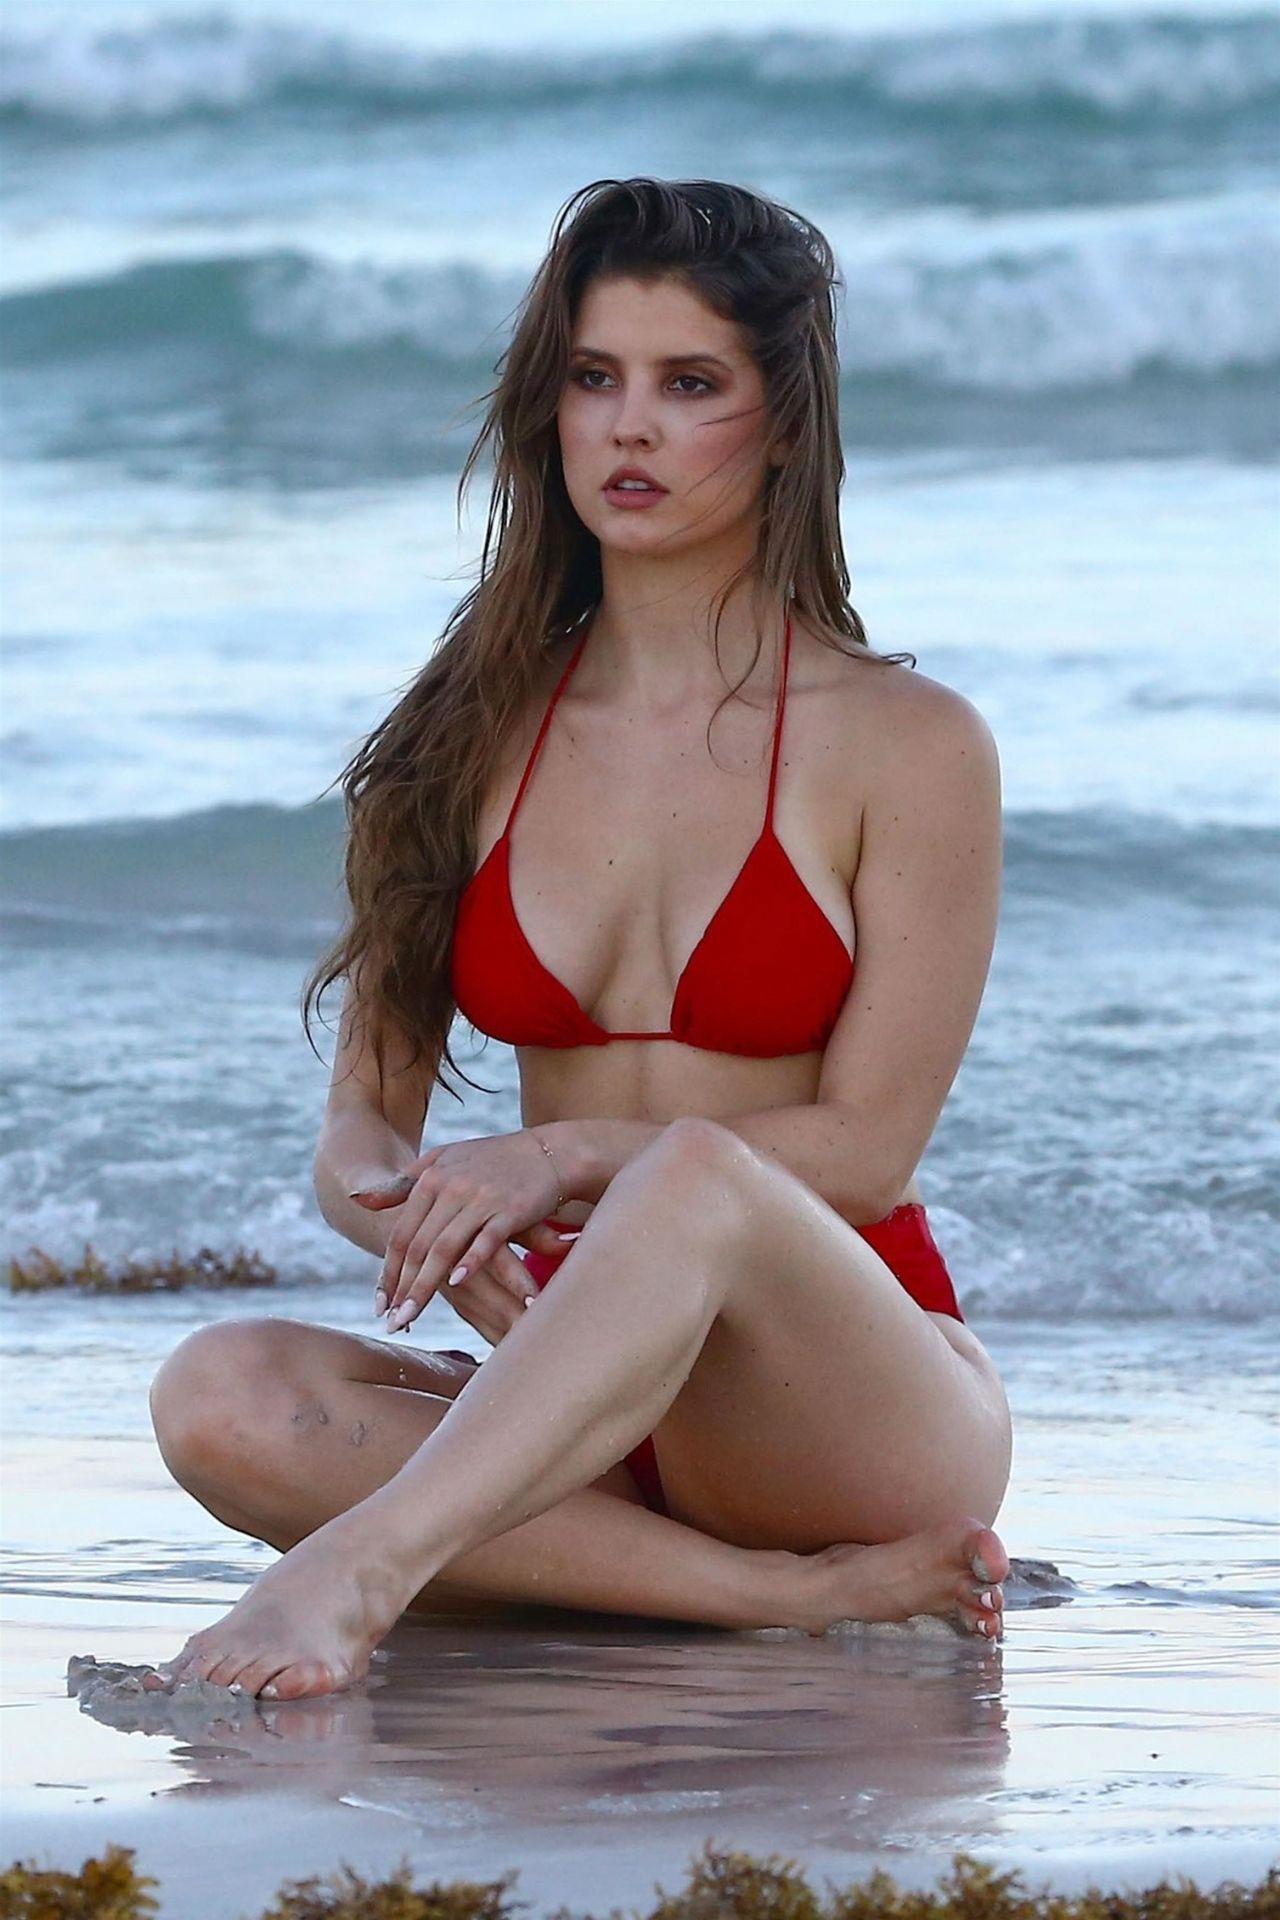 Amanda Cerny Showing Off Her Bikini Body in Miami 07/27/2017